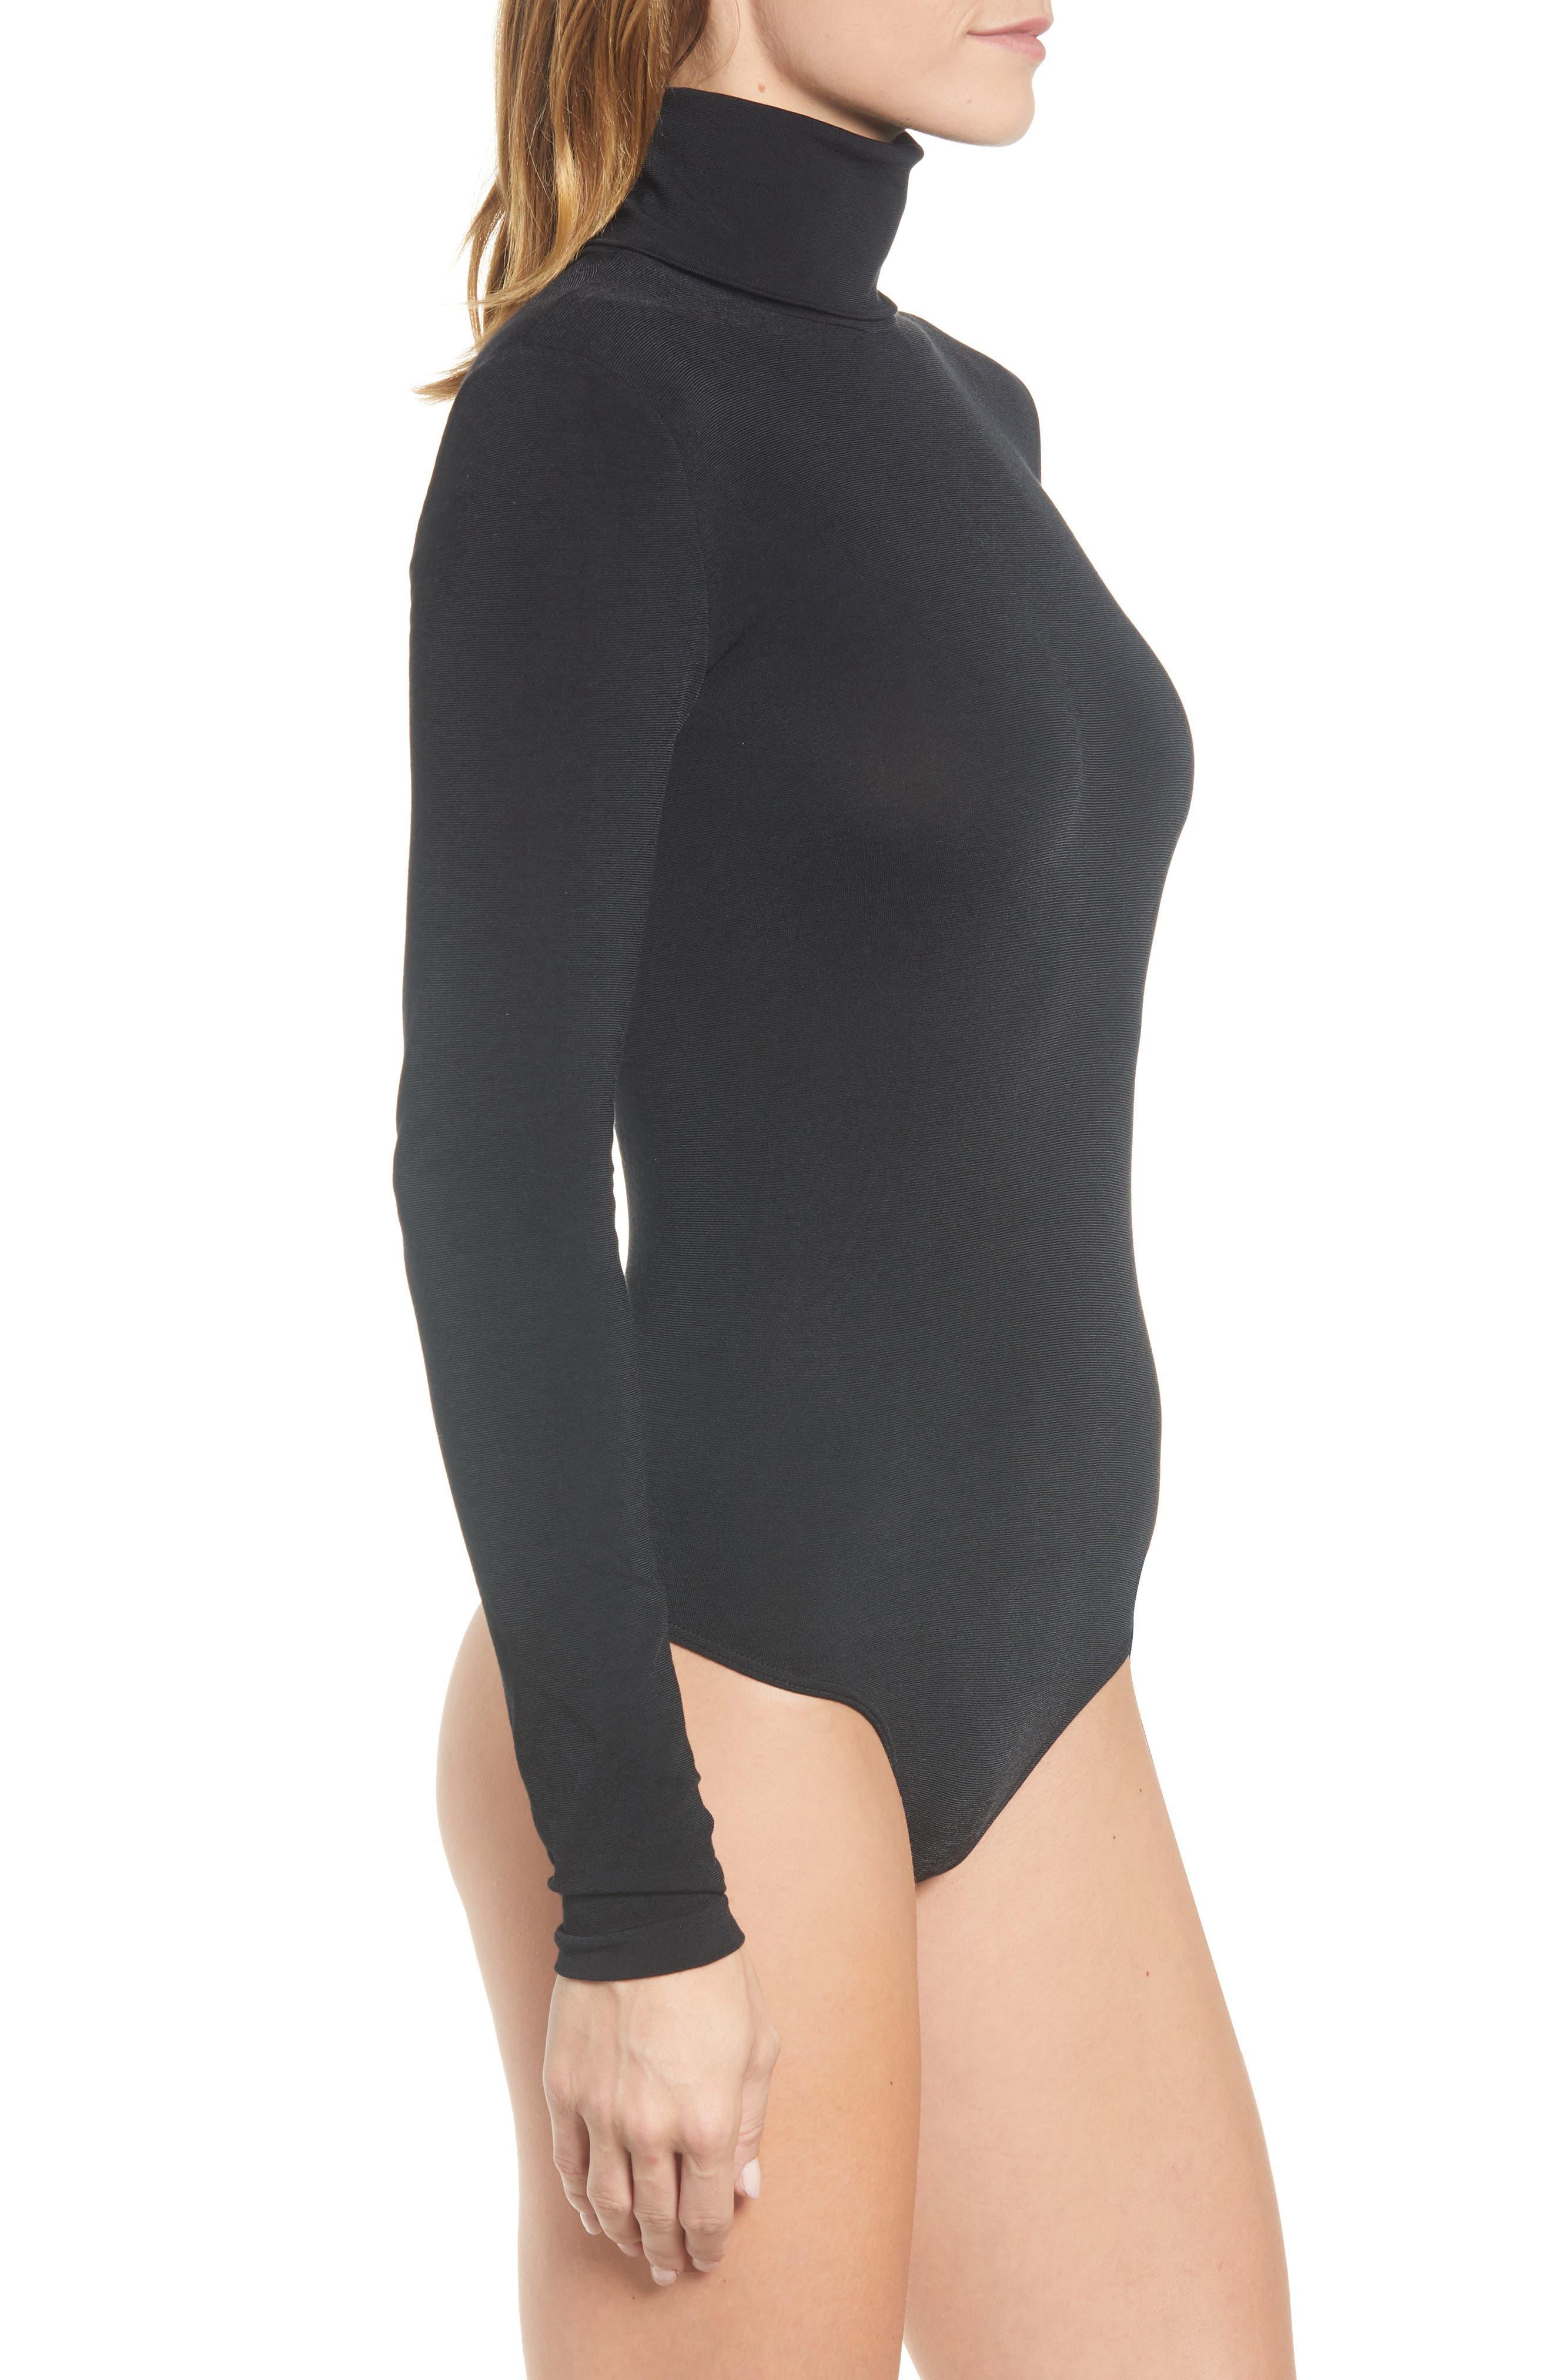 WOLFORD,                             'Colorado' Bodysuit,                             Alternate thumbnail 3, color,                             002